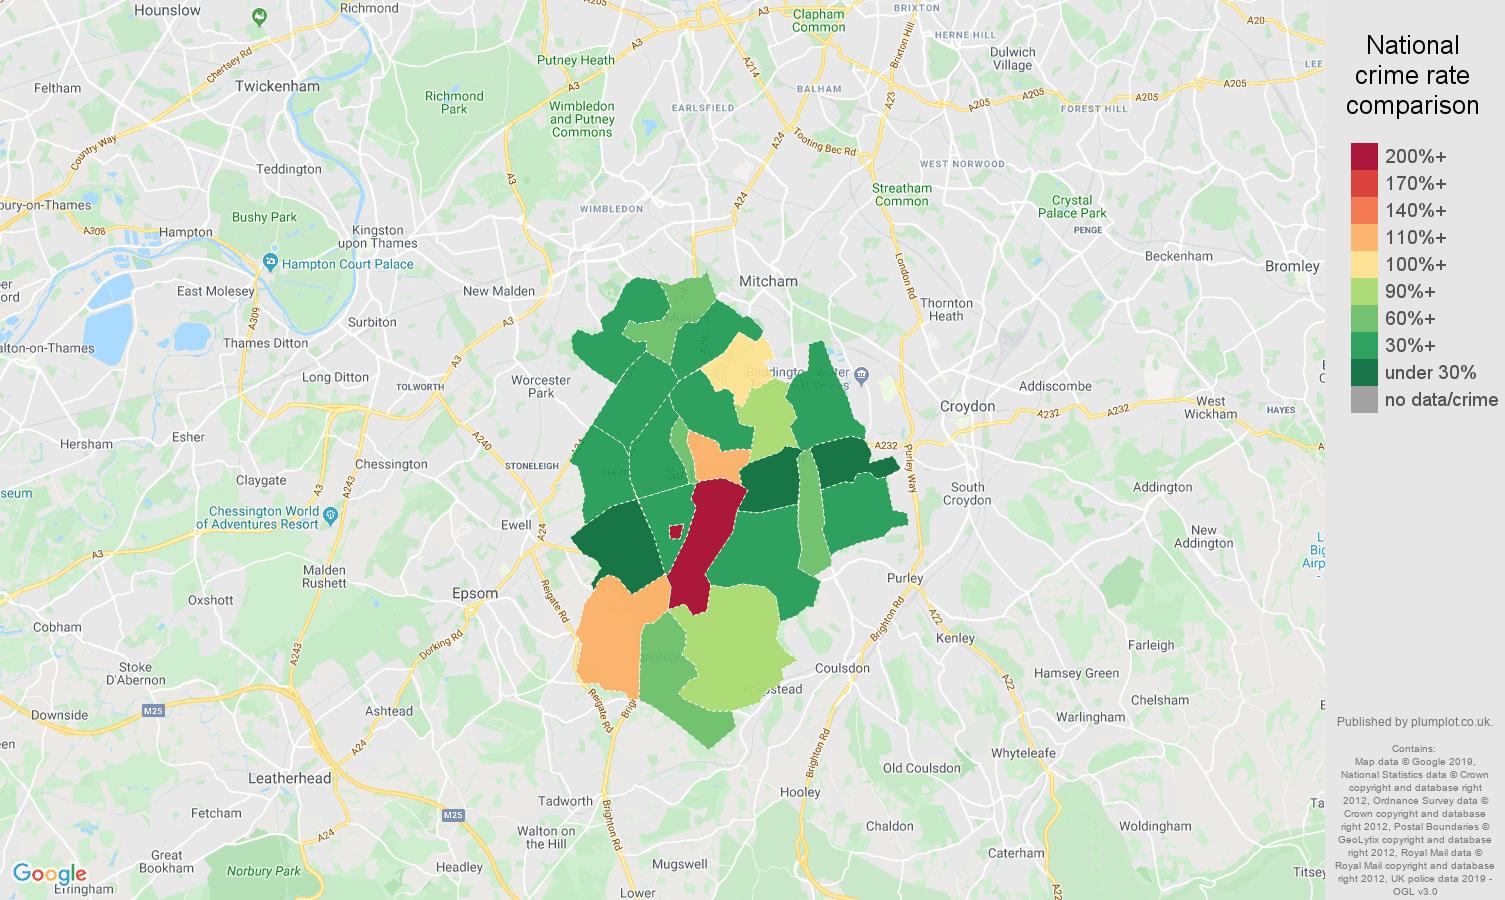 Sutton other crime rate comparison map